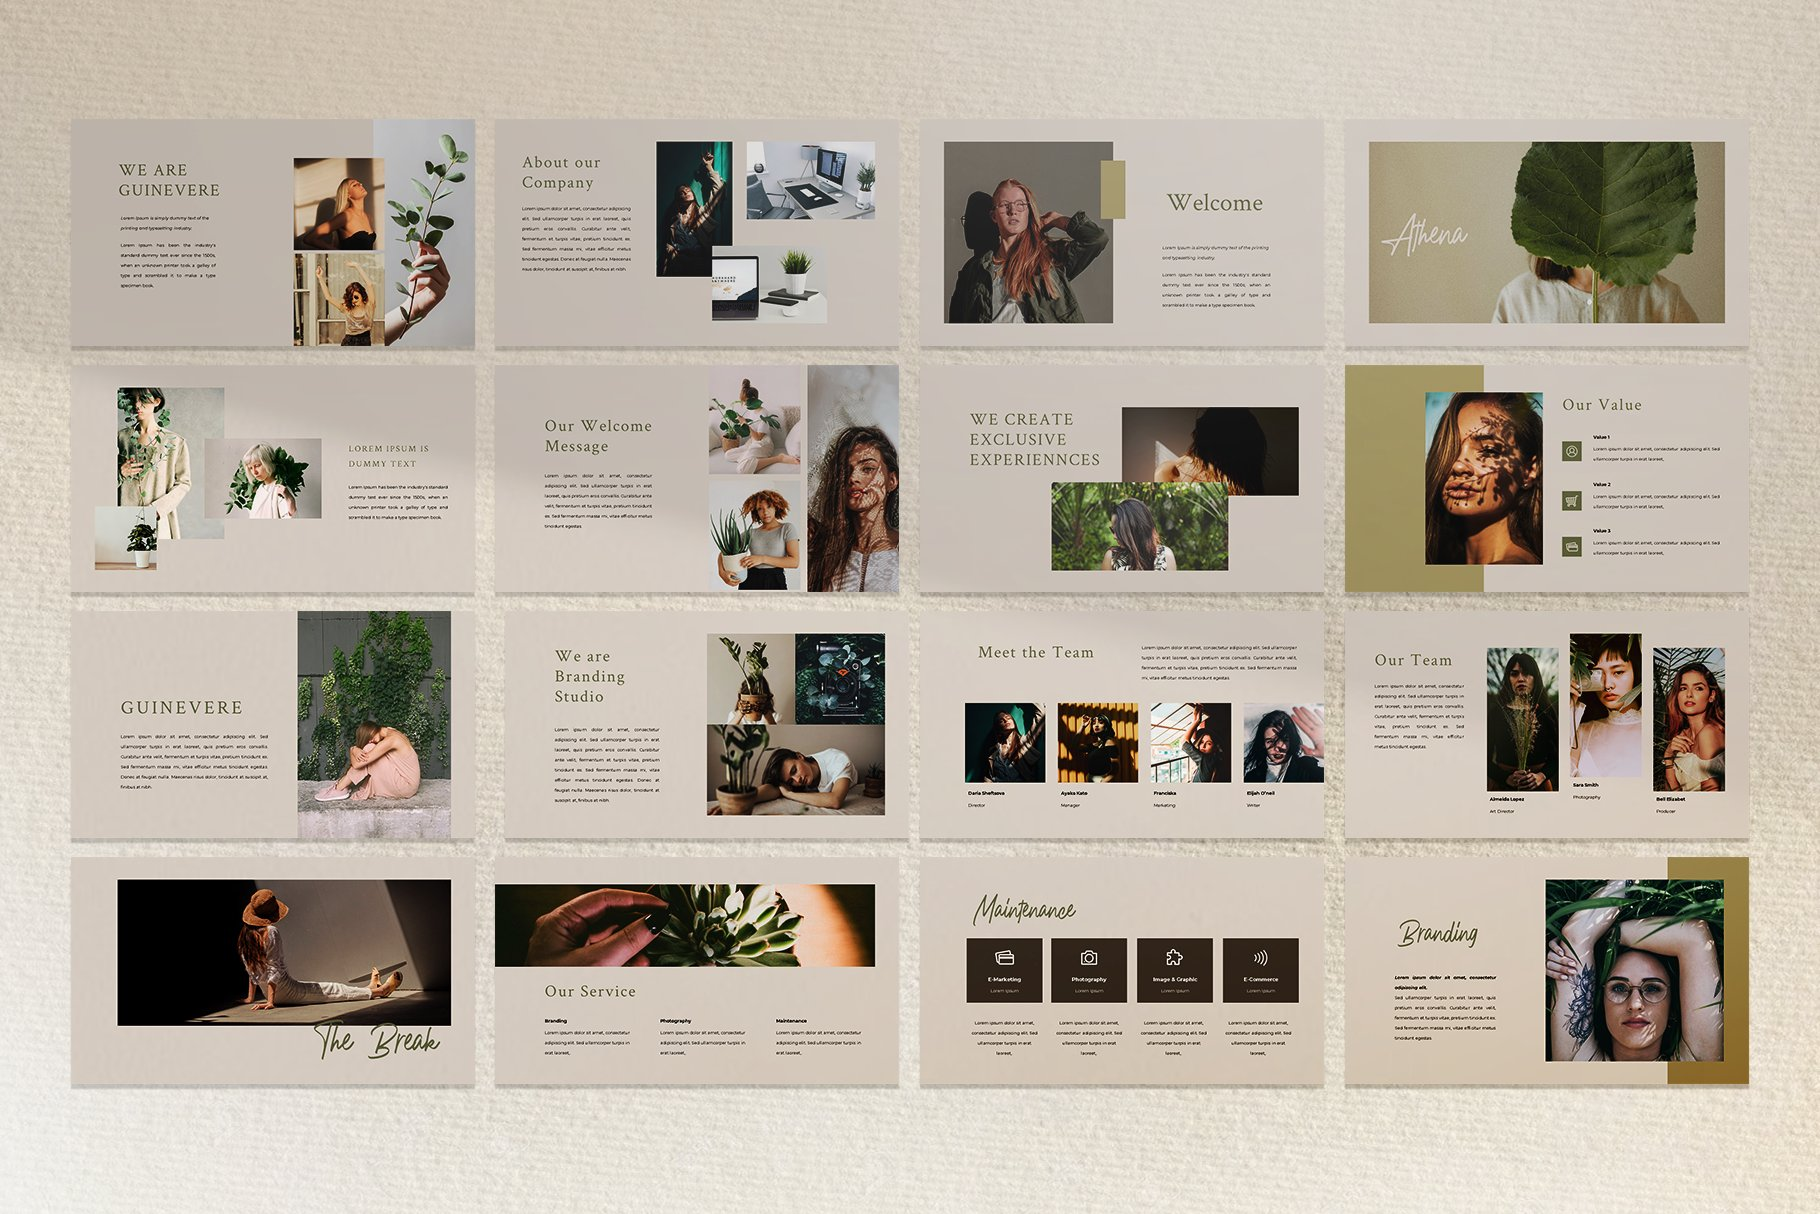 时尚品牌摄影作品集营销PPT幻灯片设计模板 Guinevere Presentation Template插图(2)